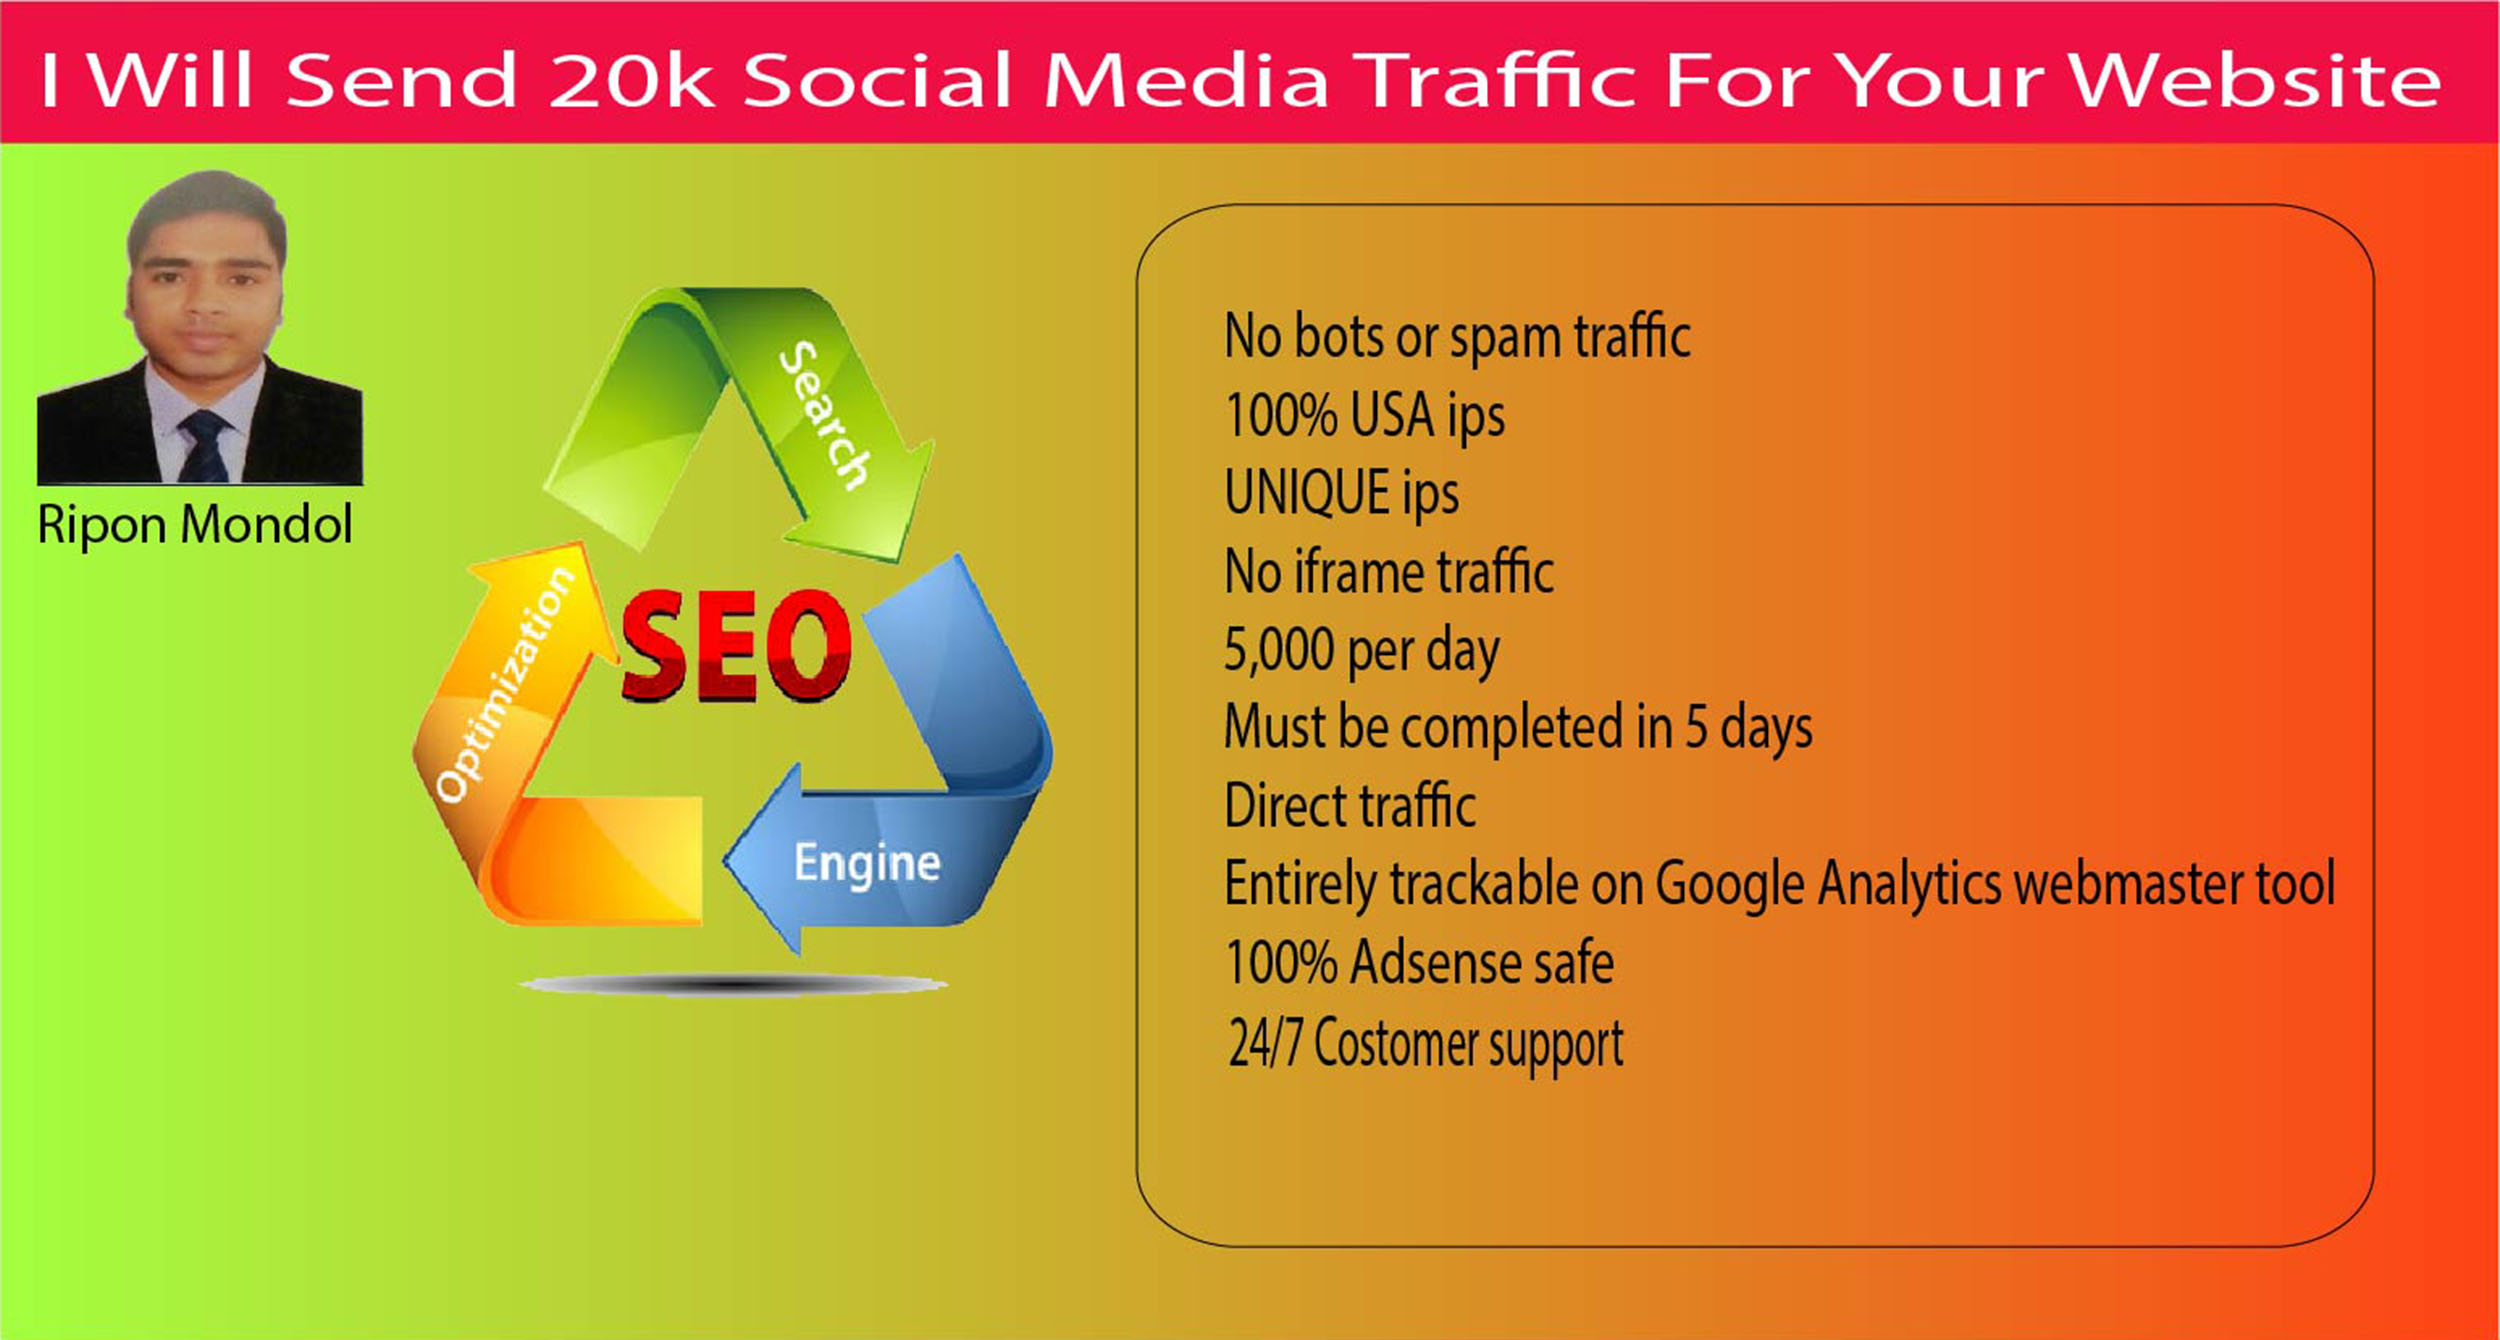 I will provide 20k google organic traffic to website